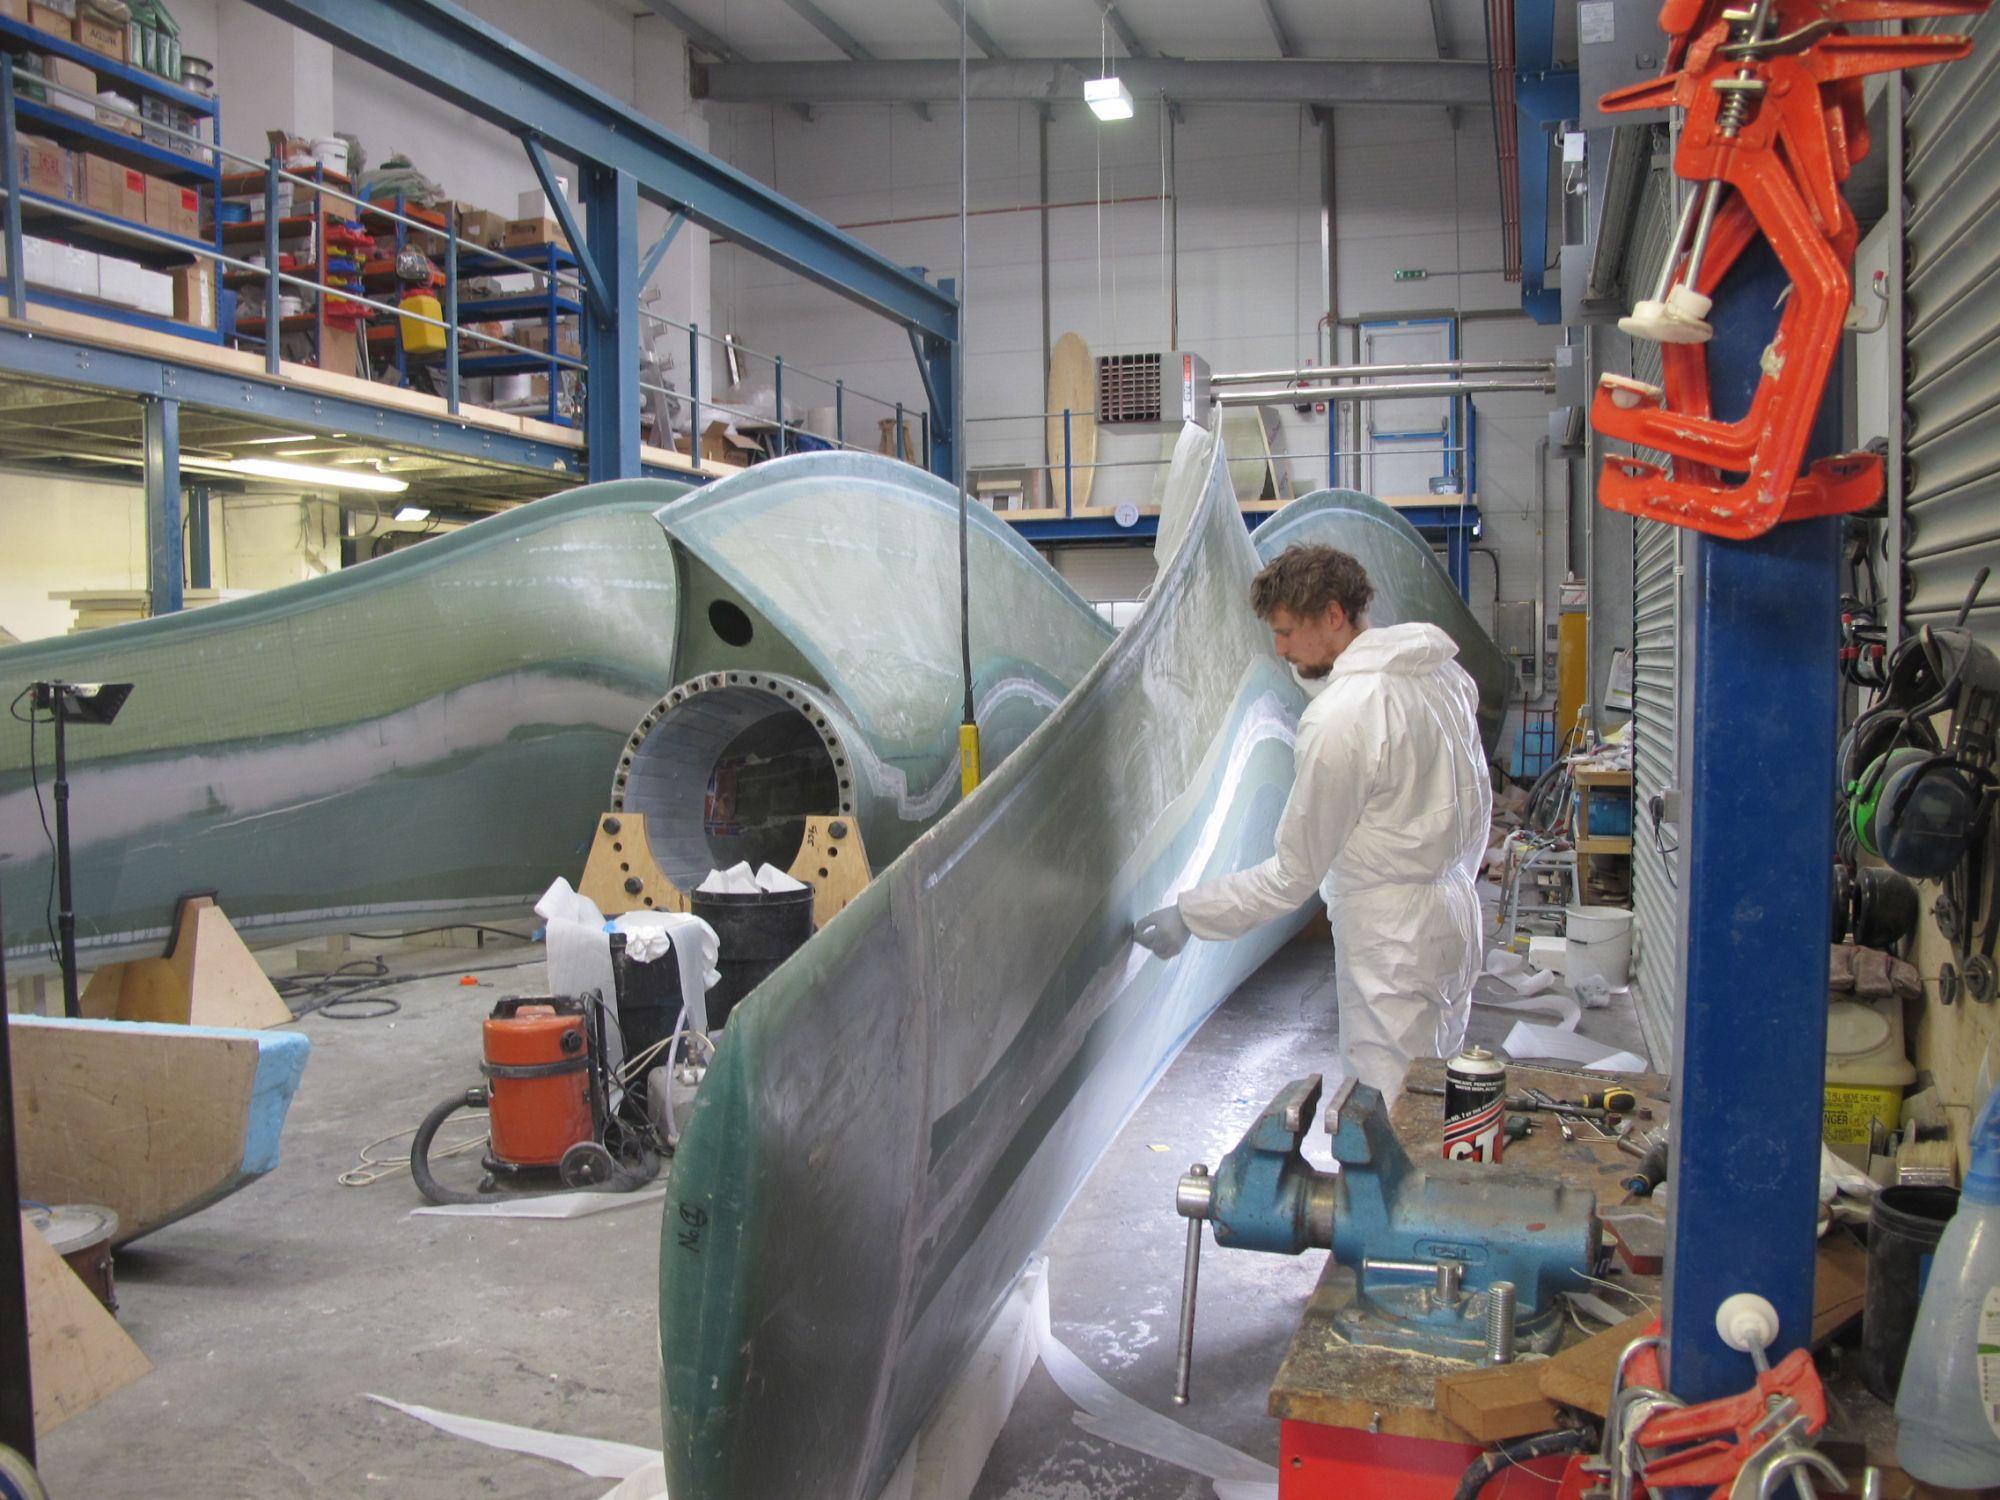 Tidal Turbine Blades under construction